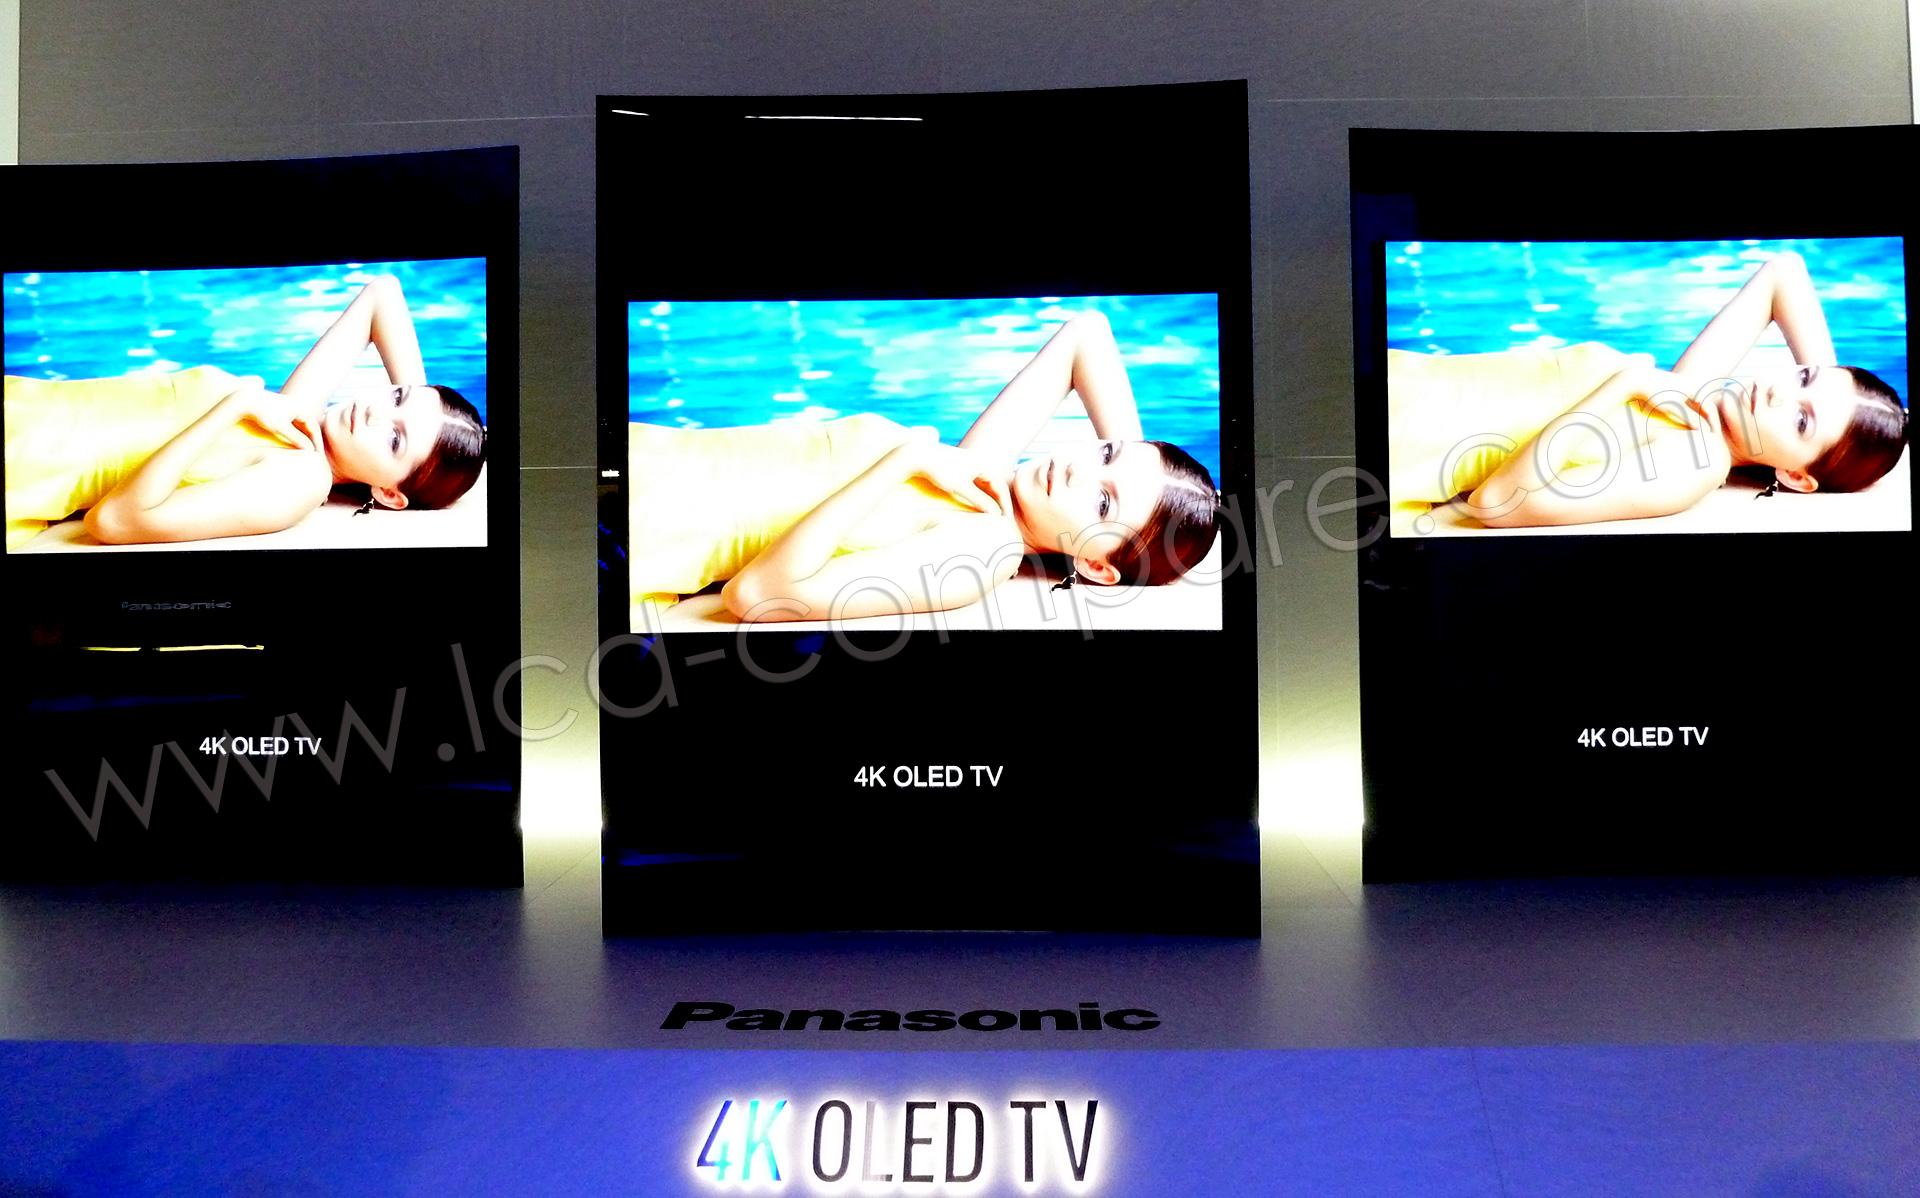 dossier sur les tv ultra hd tv uhd tv 4k quad hd apprenez en davantage sur les tv ultra. Black Bedroom Furniture Sets. Home Design Ideas